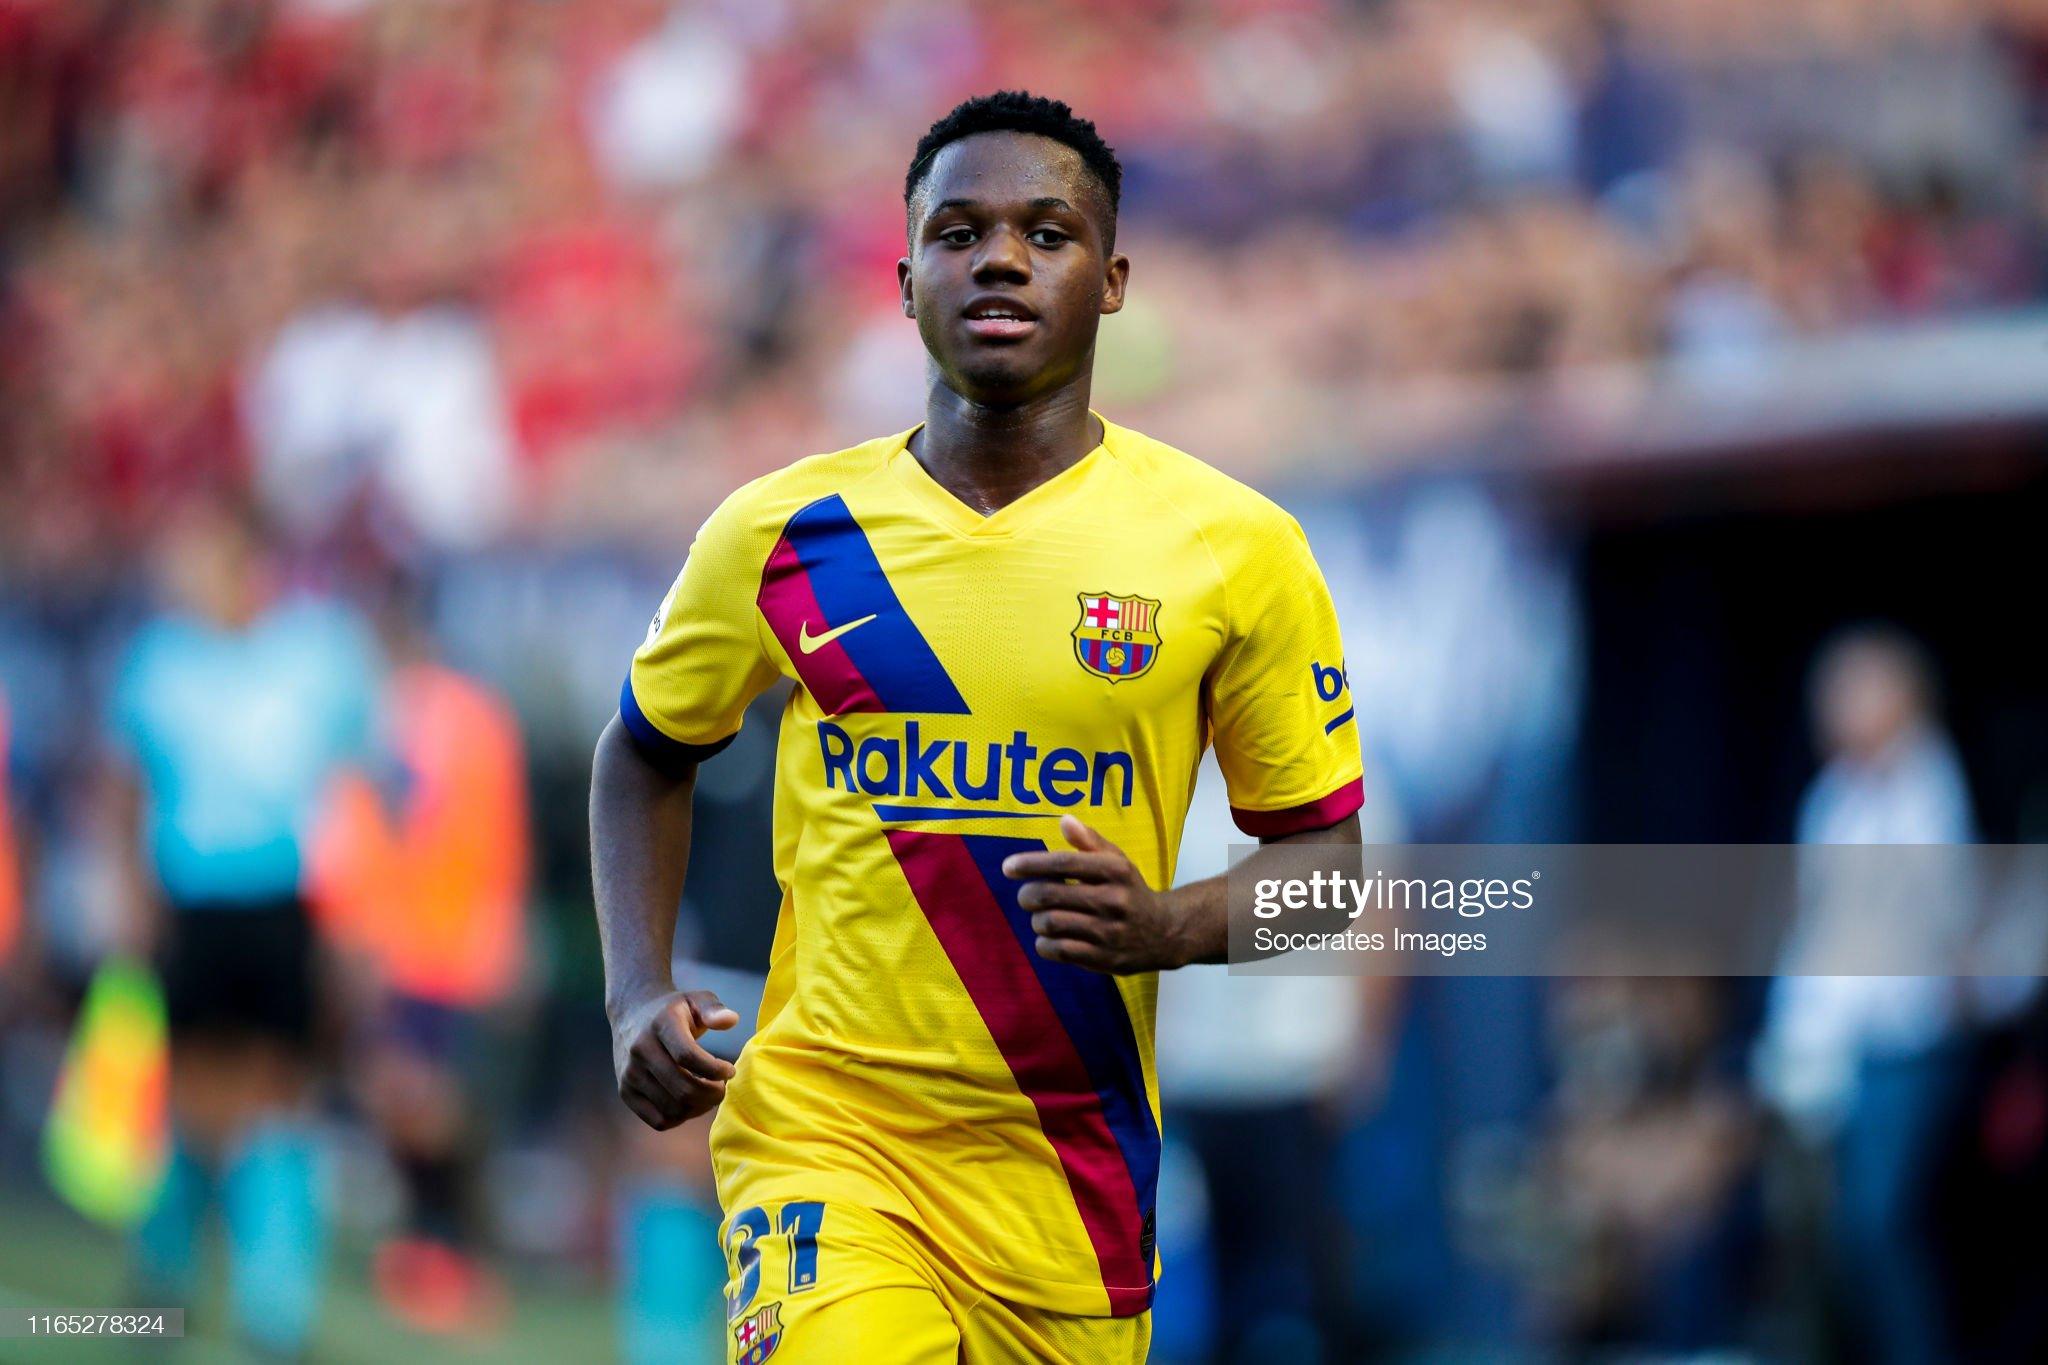 صور مباراة : أوساسونا - برشلونة 2-2 ( 31-08-2019 )  Ansu-fati-of-fc-barcelona-during-the-la-liga-santander-match-between-picture-id1165278324?s=2048x2048